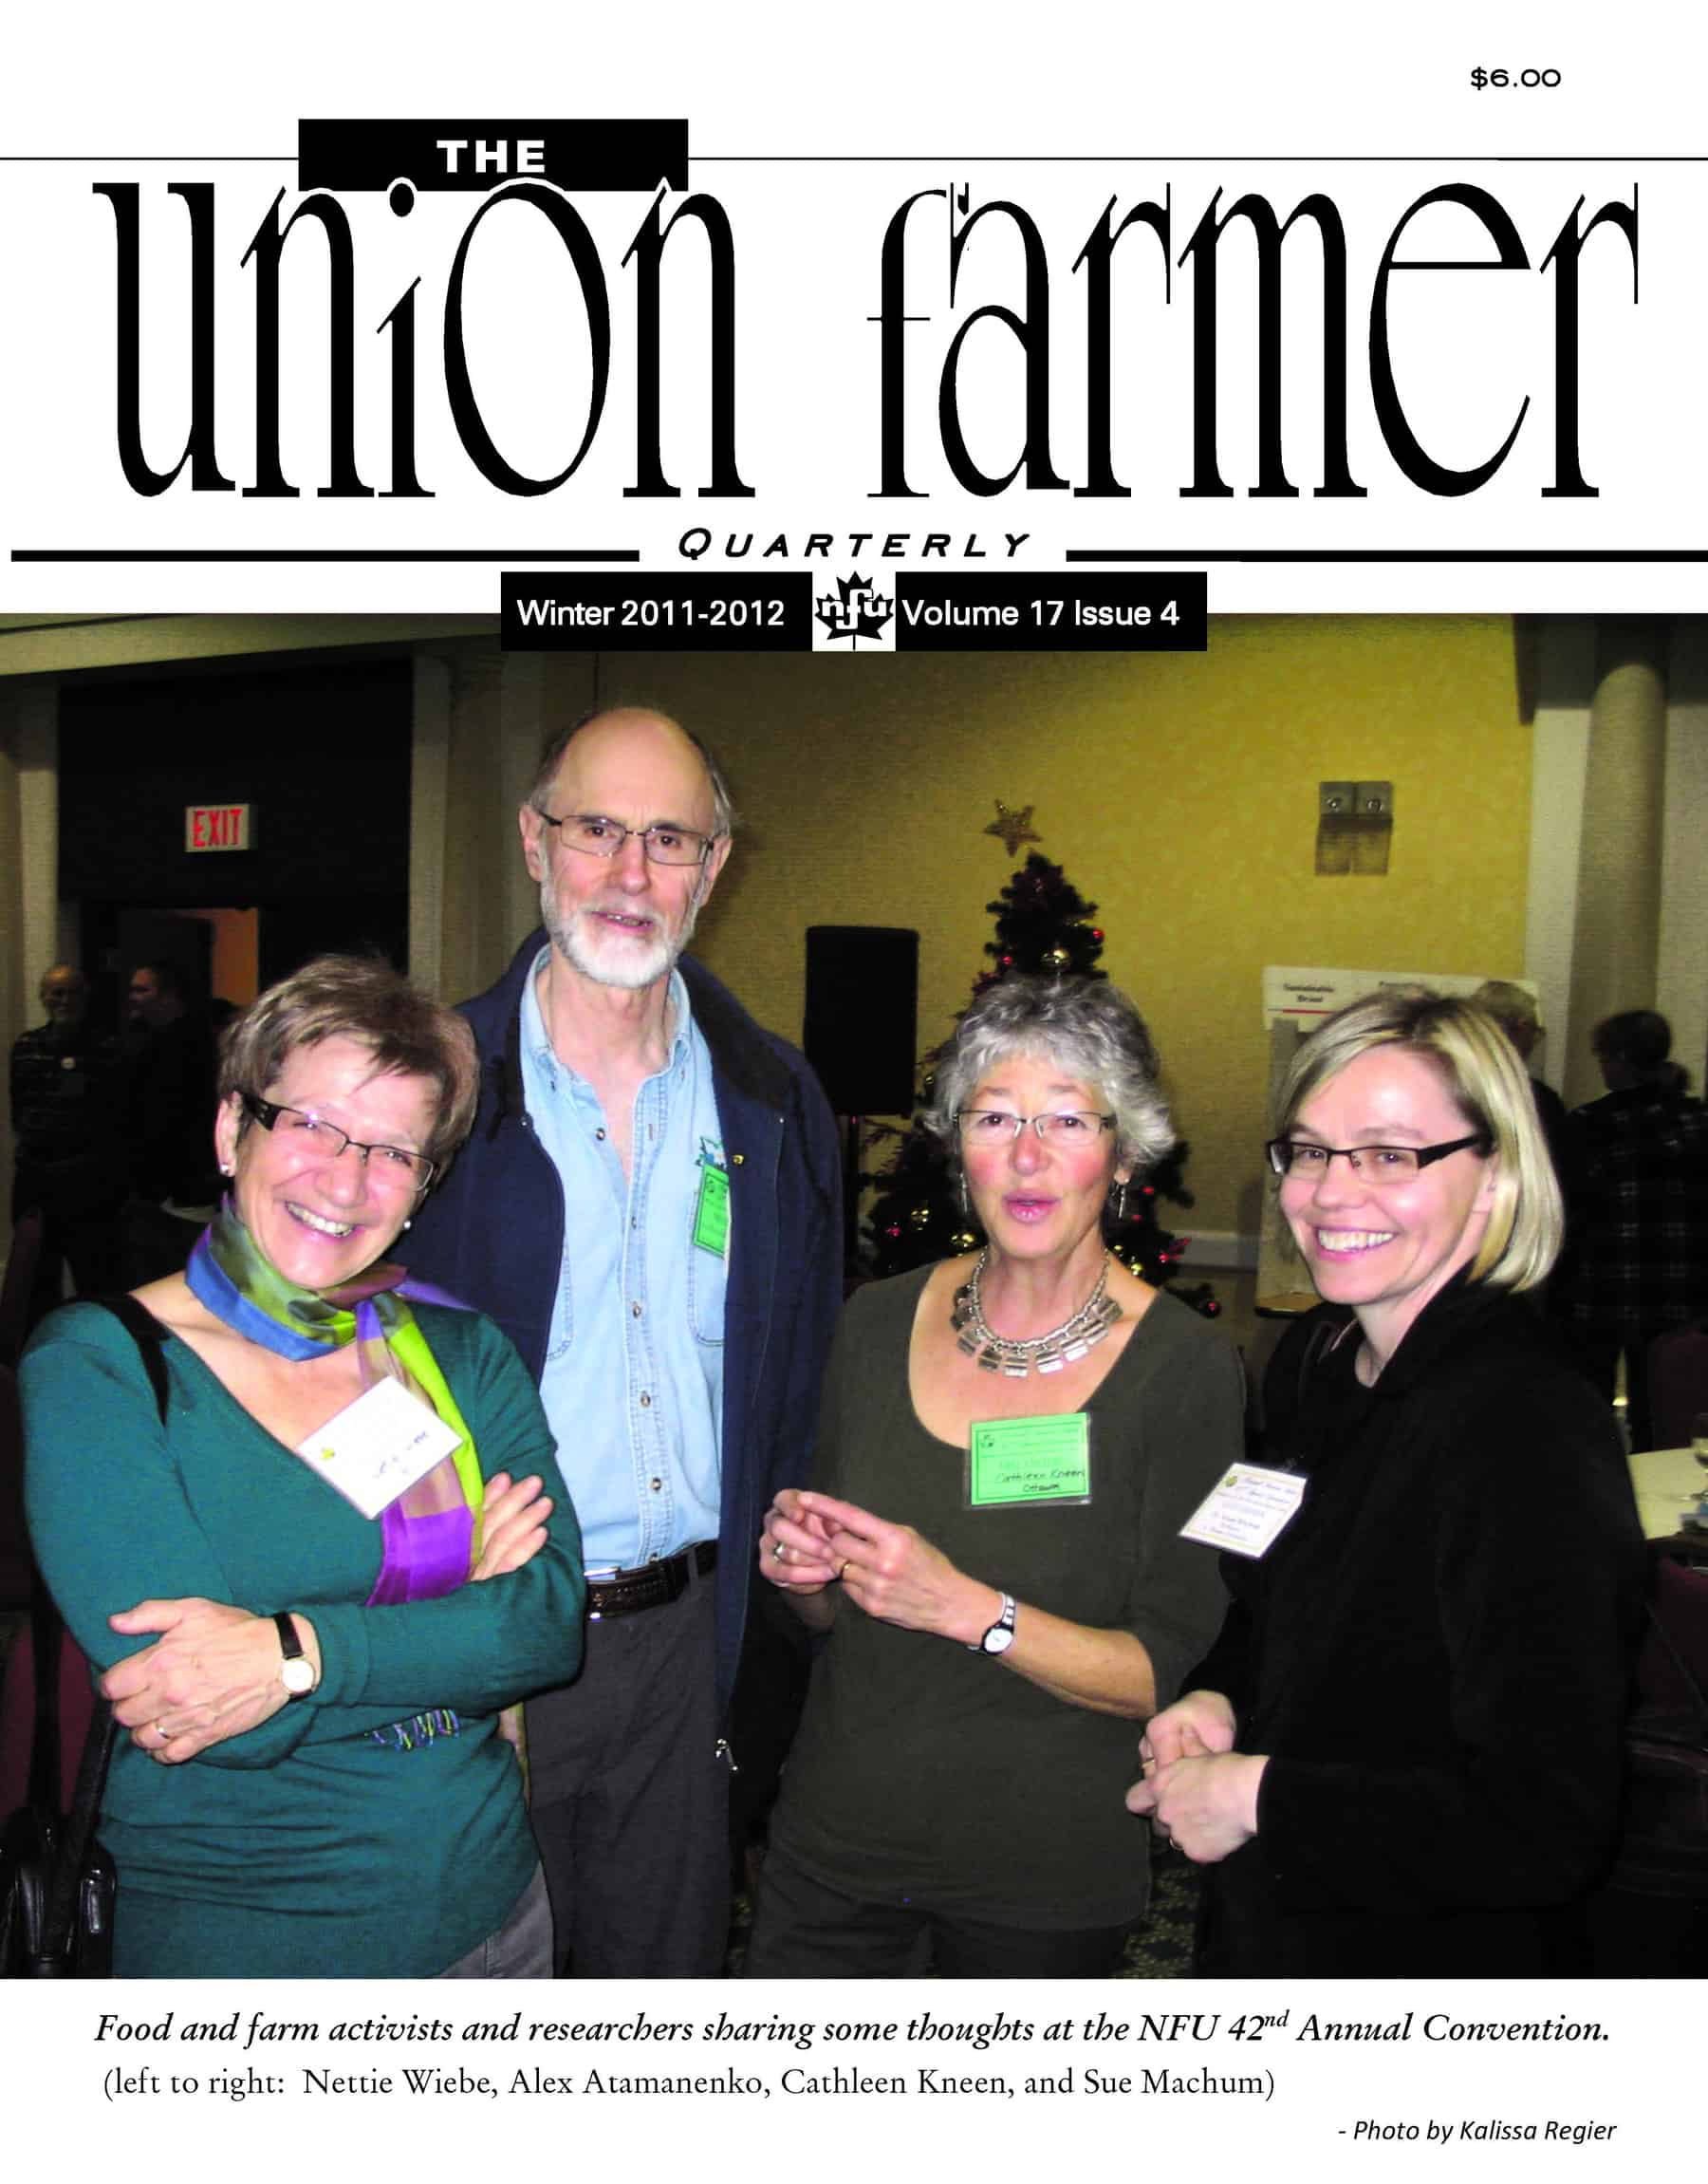 Union Farmer Quarterly: Winter 2012